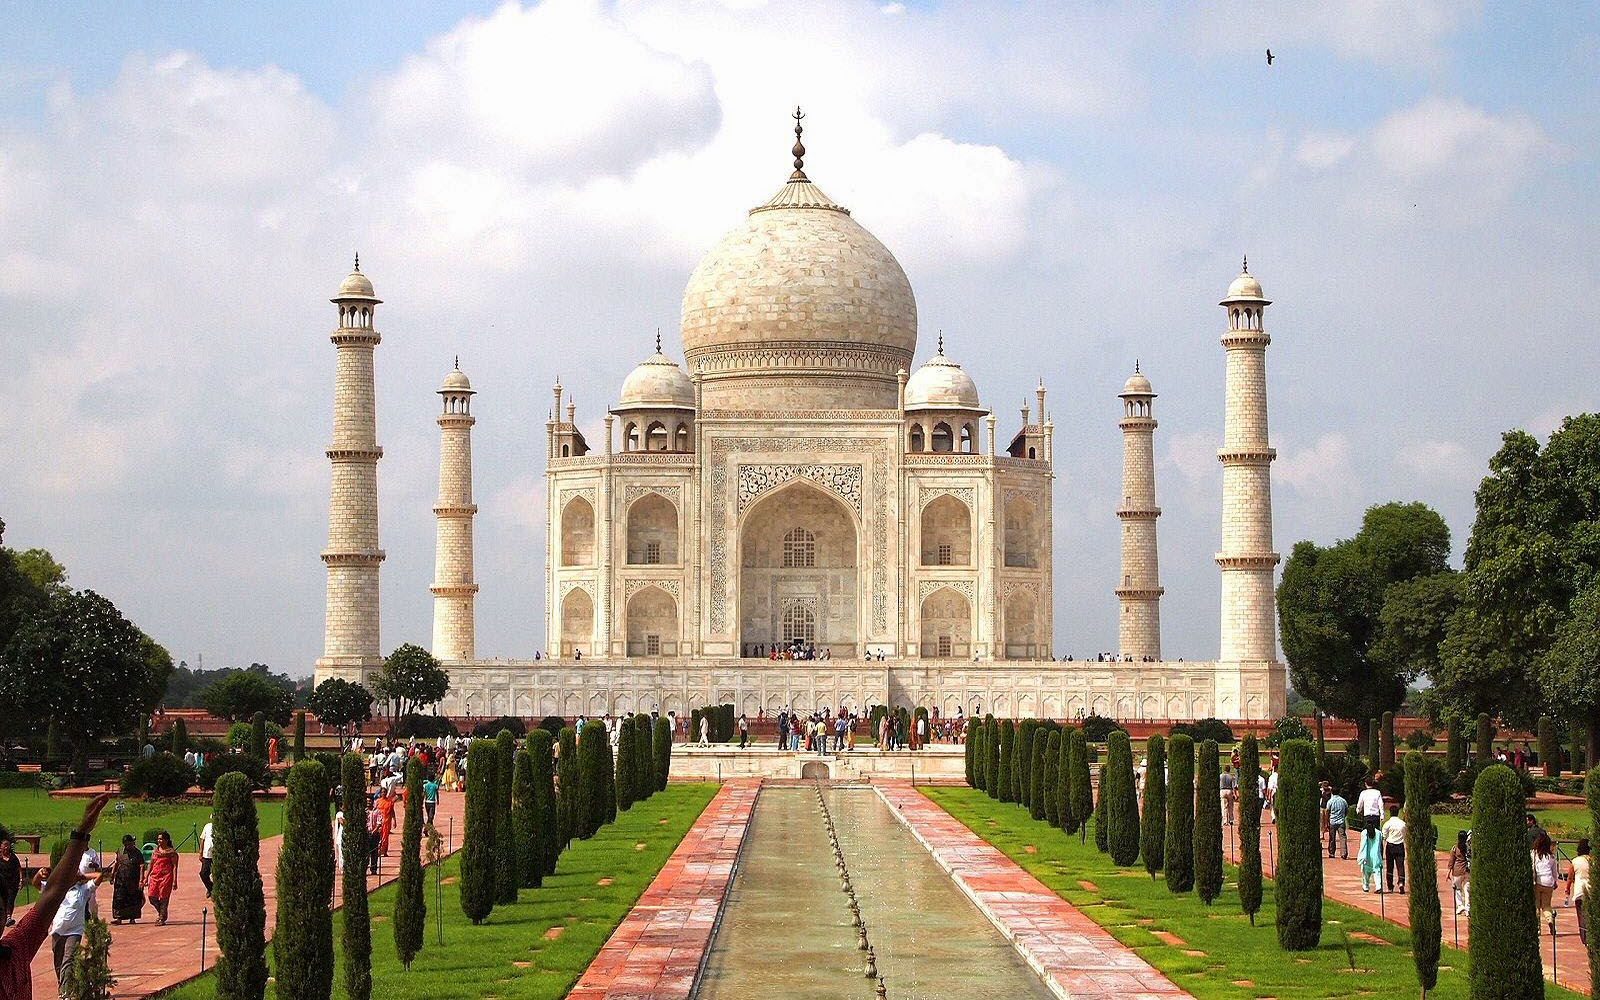 Wallpapers taj mahal wallpapers - Taj mahal background hd ...